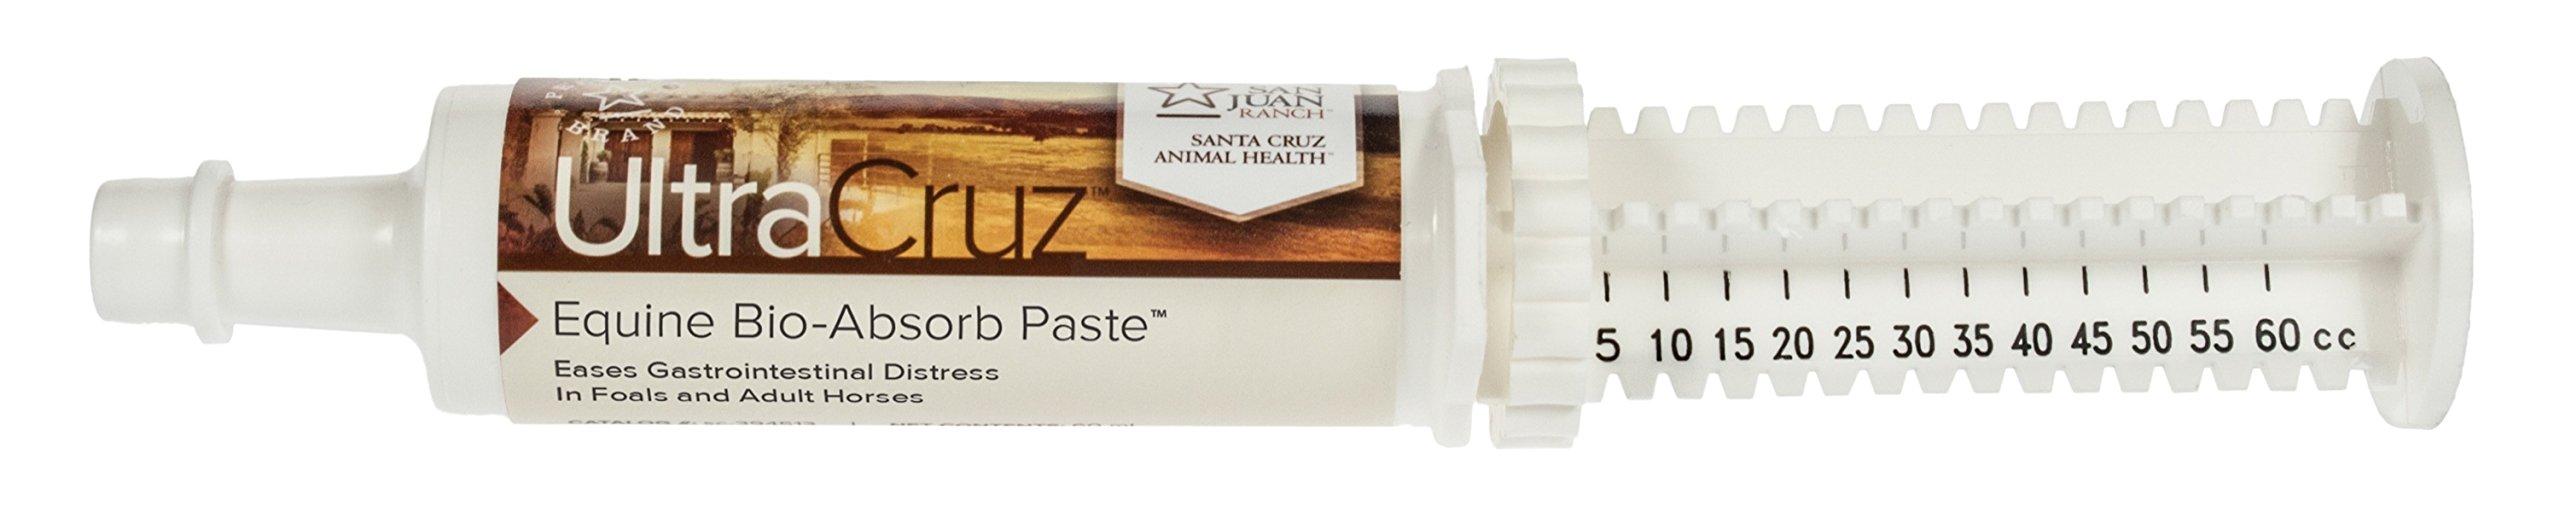 UltraCruz Equine Bio-Absorb Supplement for Horses, 60 ml, Paste (1/4 Day Supply) by UltraCruz